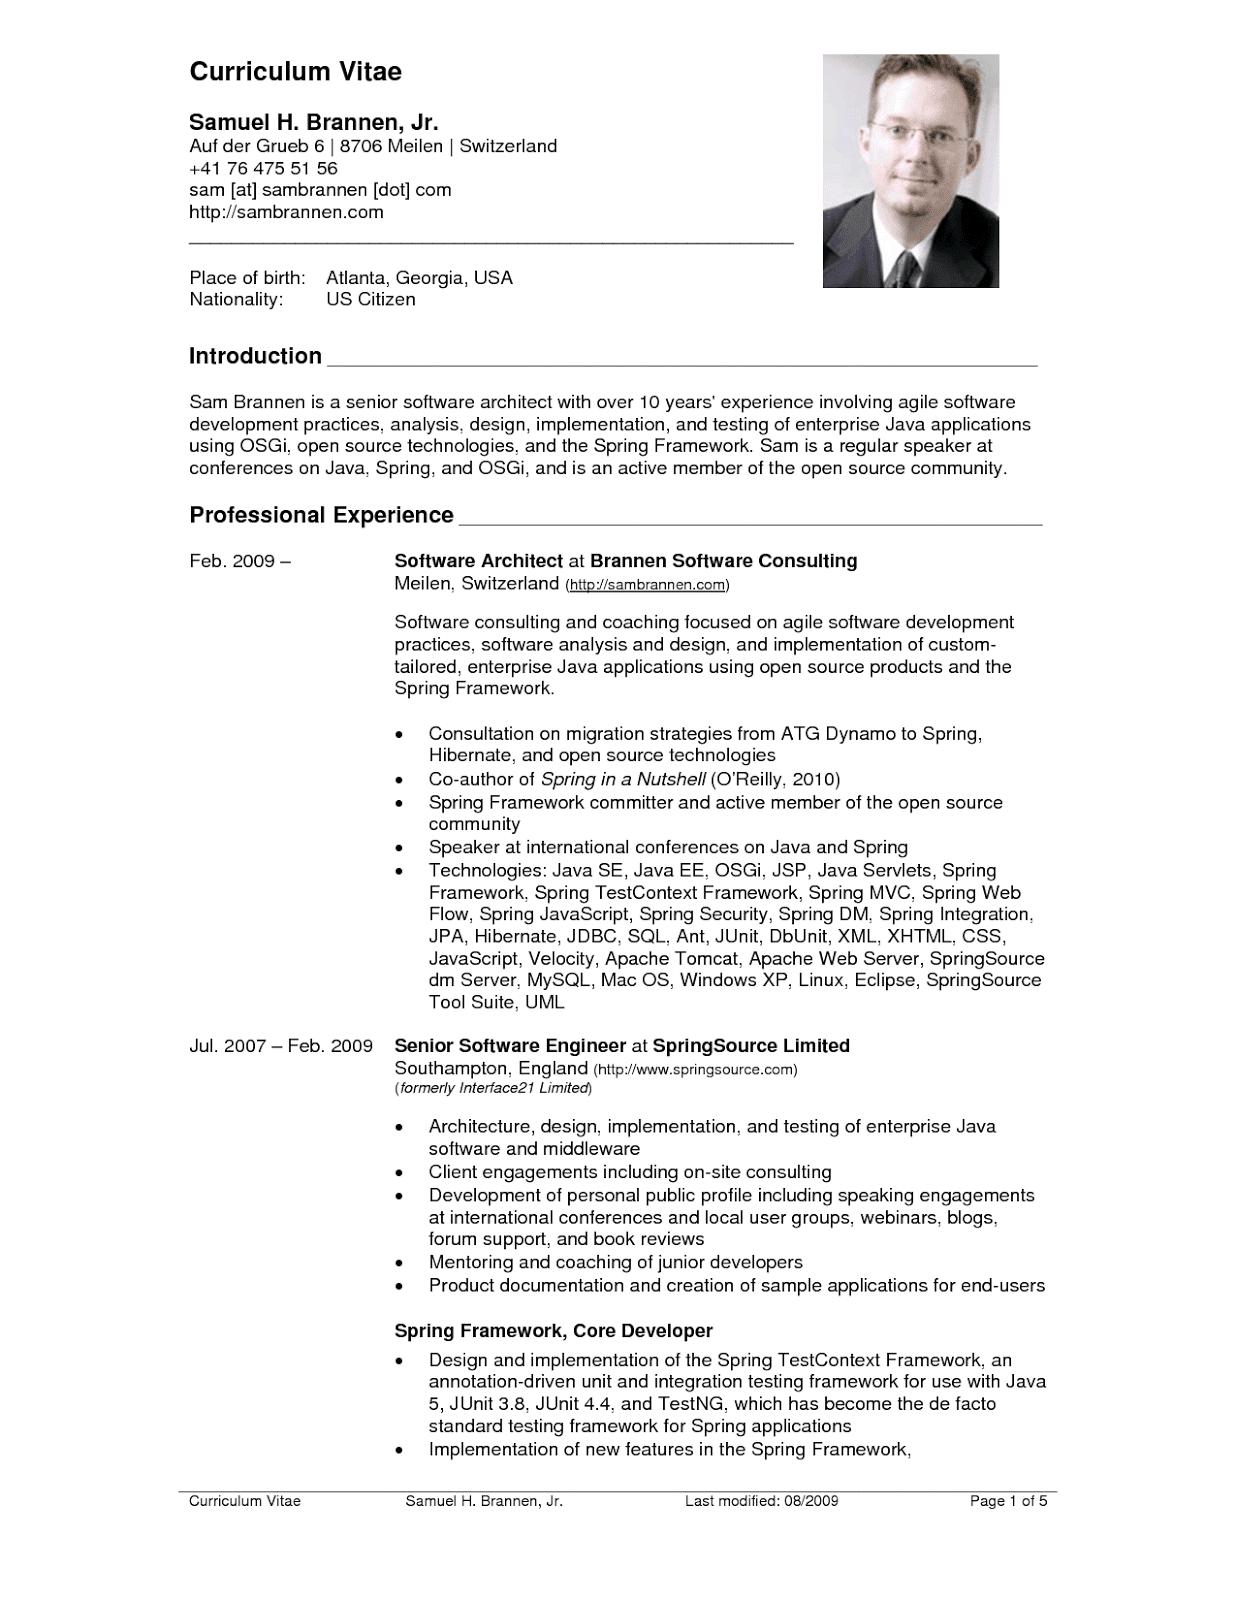 Example resume templates solarfm federal resume example resume template 2018 yelopaper Gallery